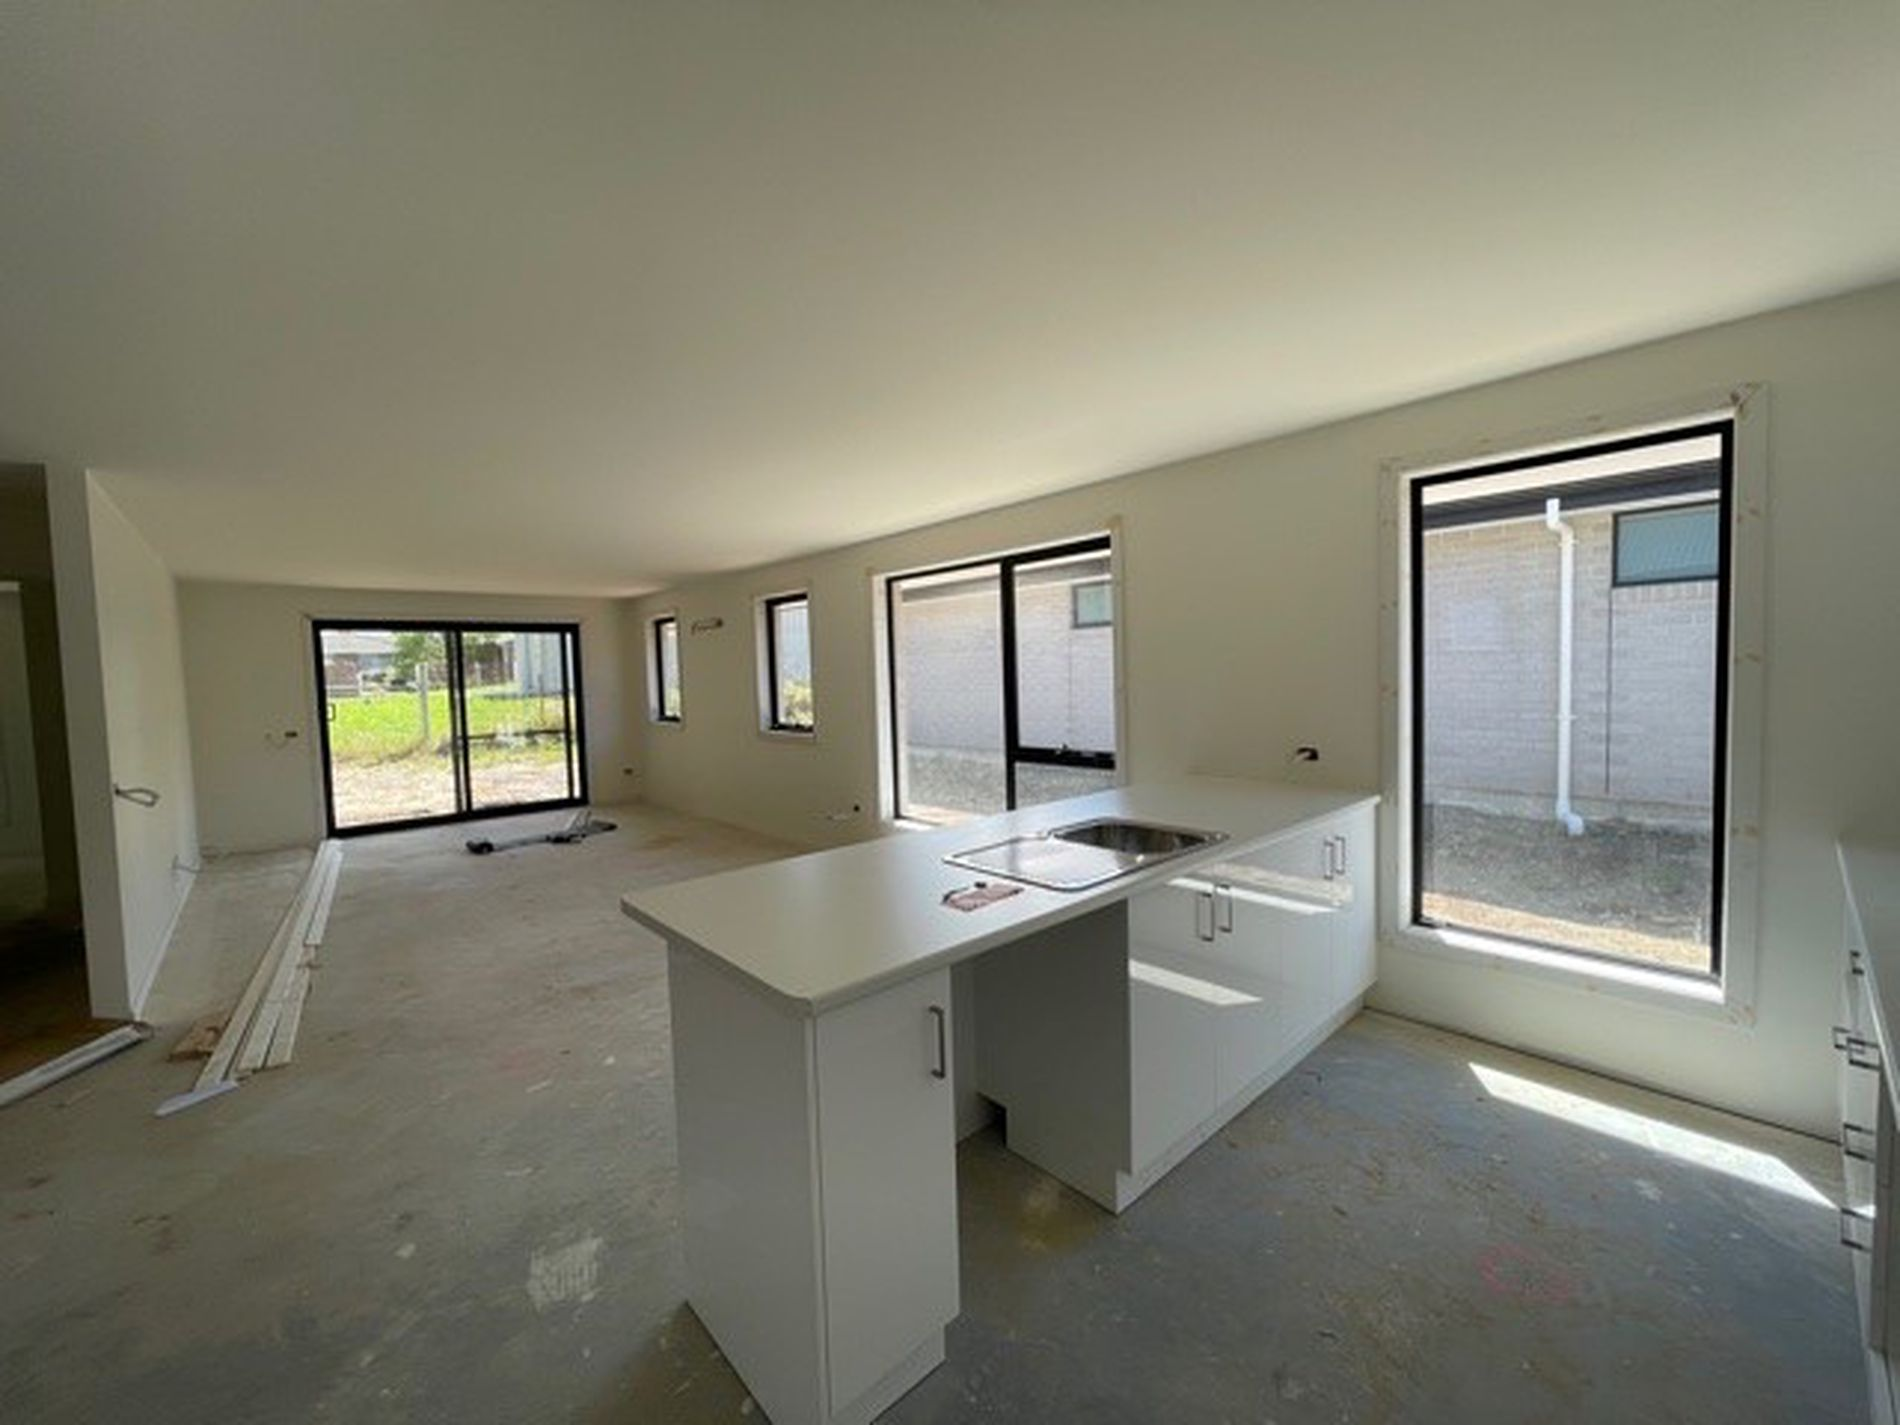 Lot 1, 2, 3, 4 & 25 Millpond Court, Wynyard